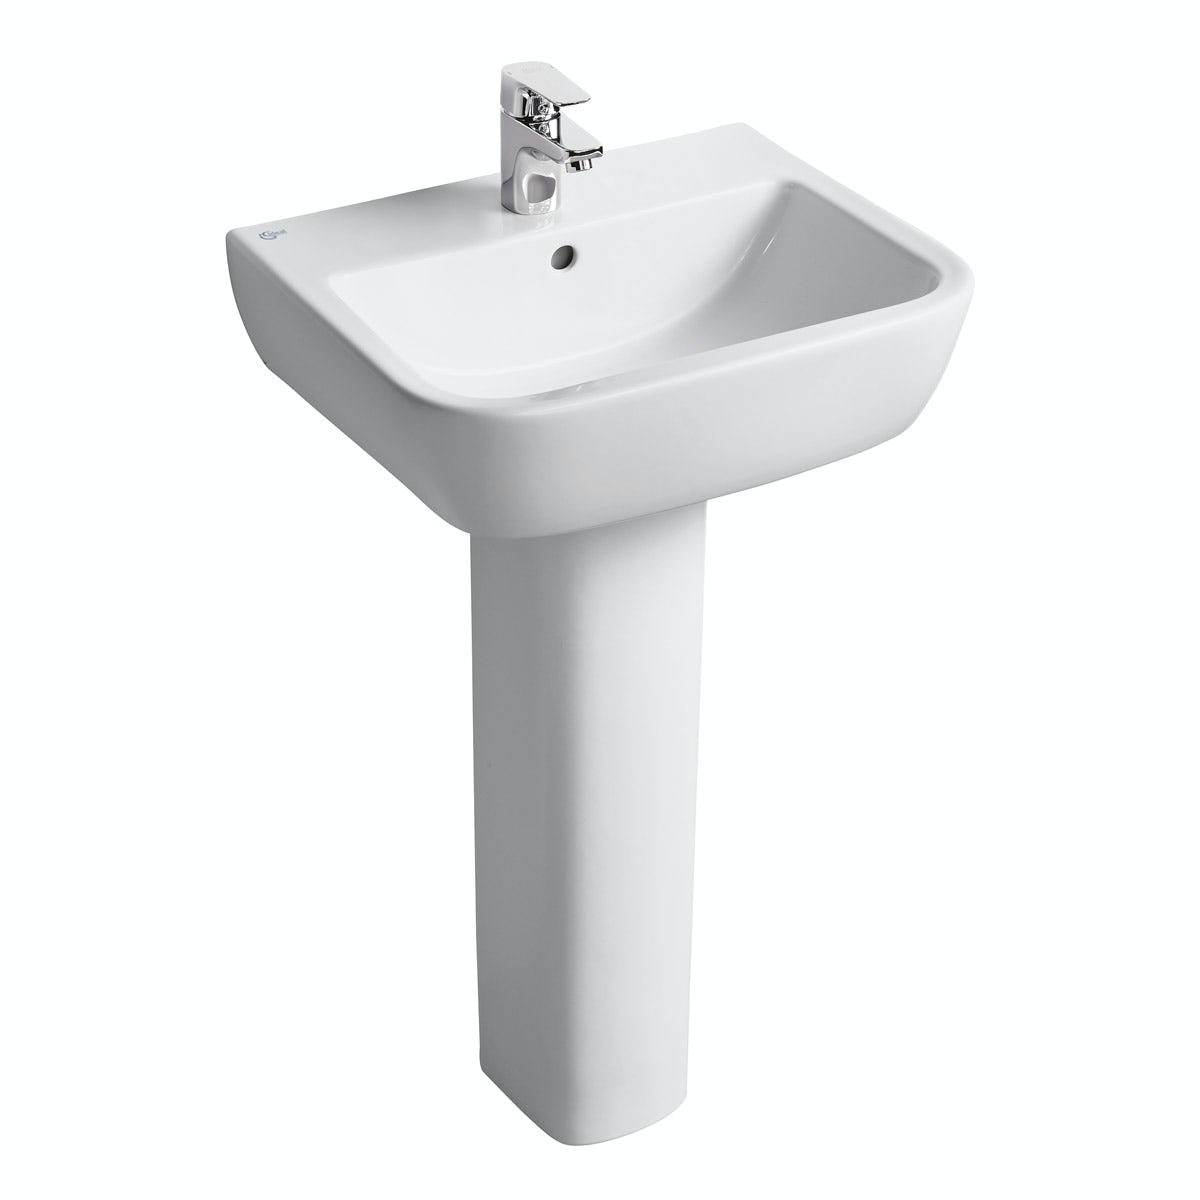 Ideal Standard Tempo 1 tap hole full pedestal basin 550mm